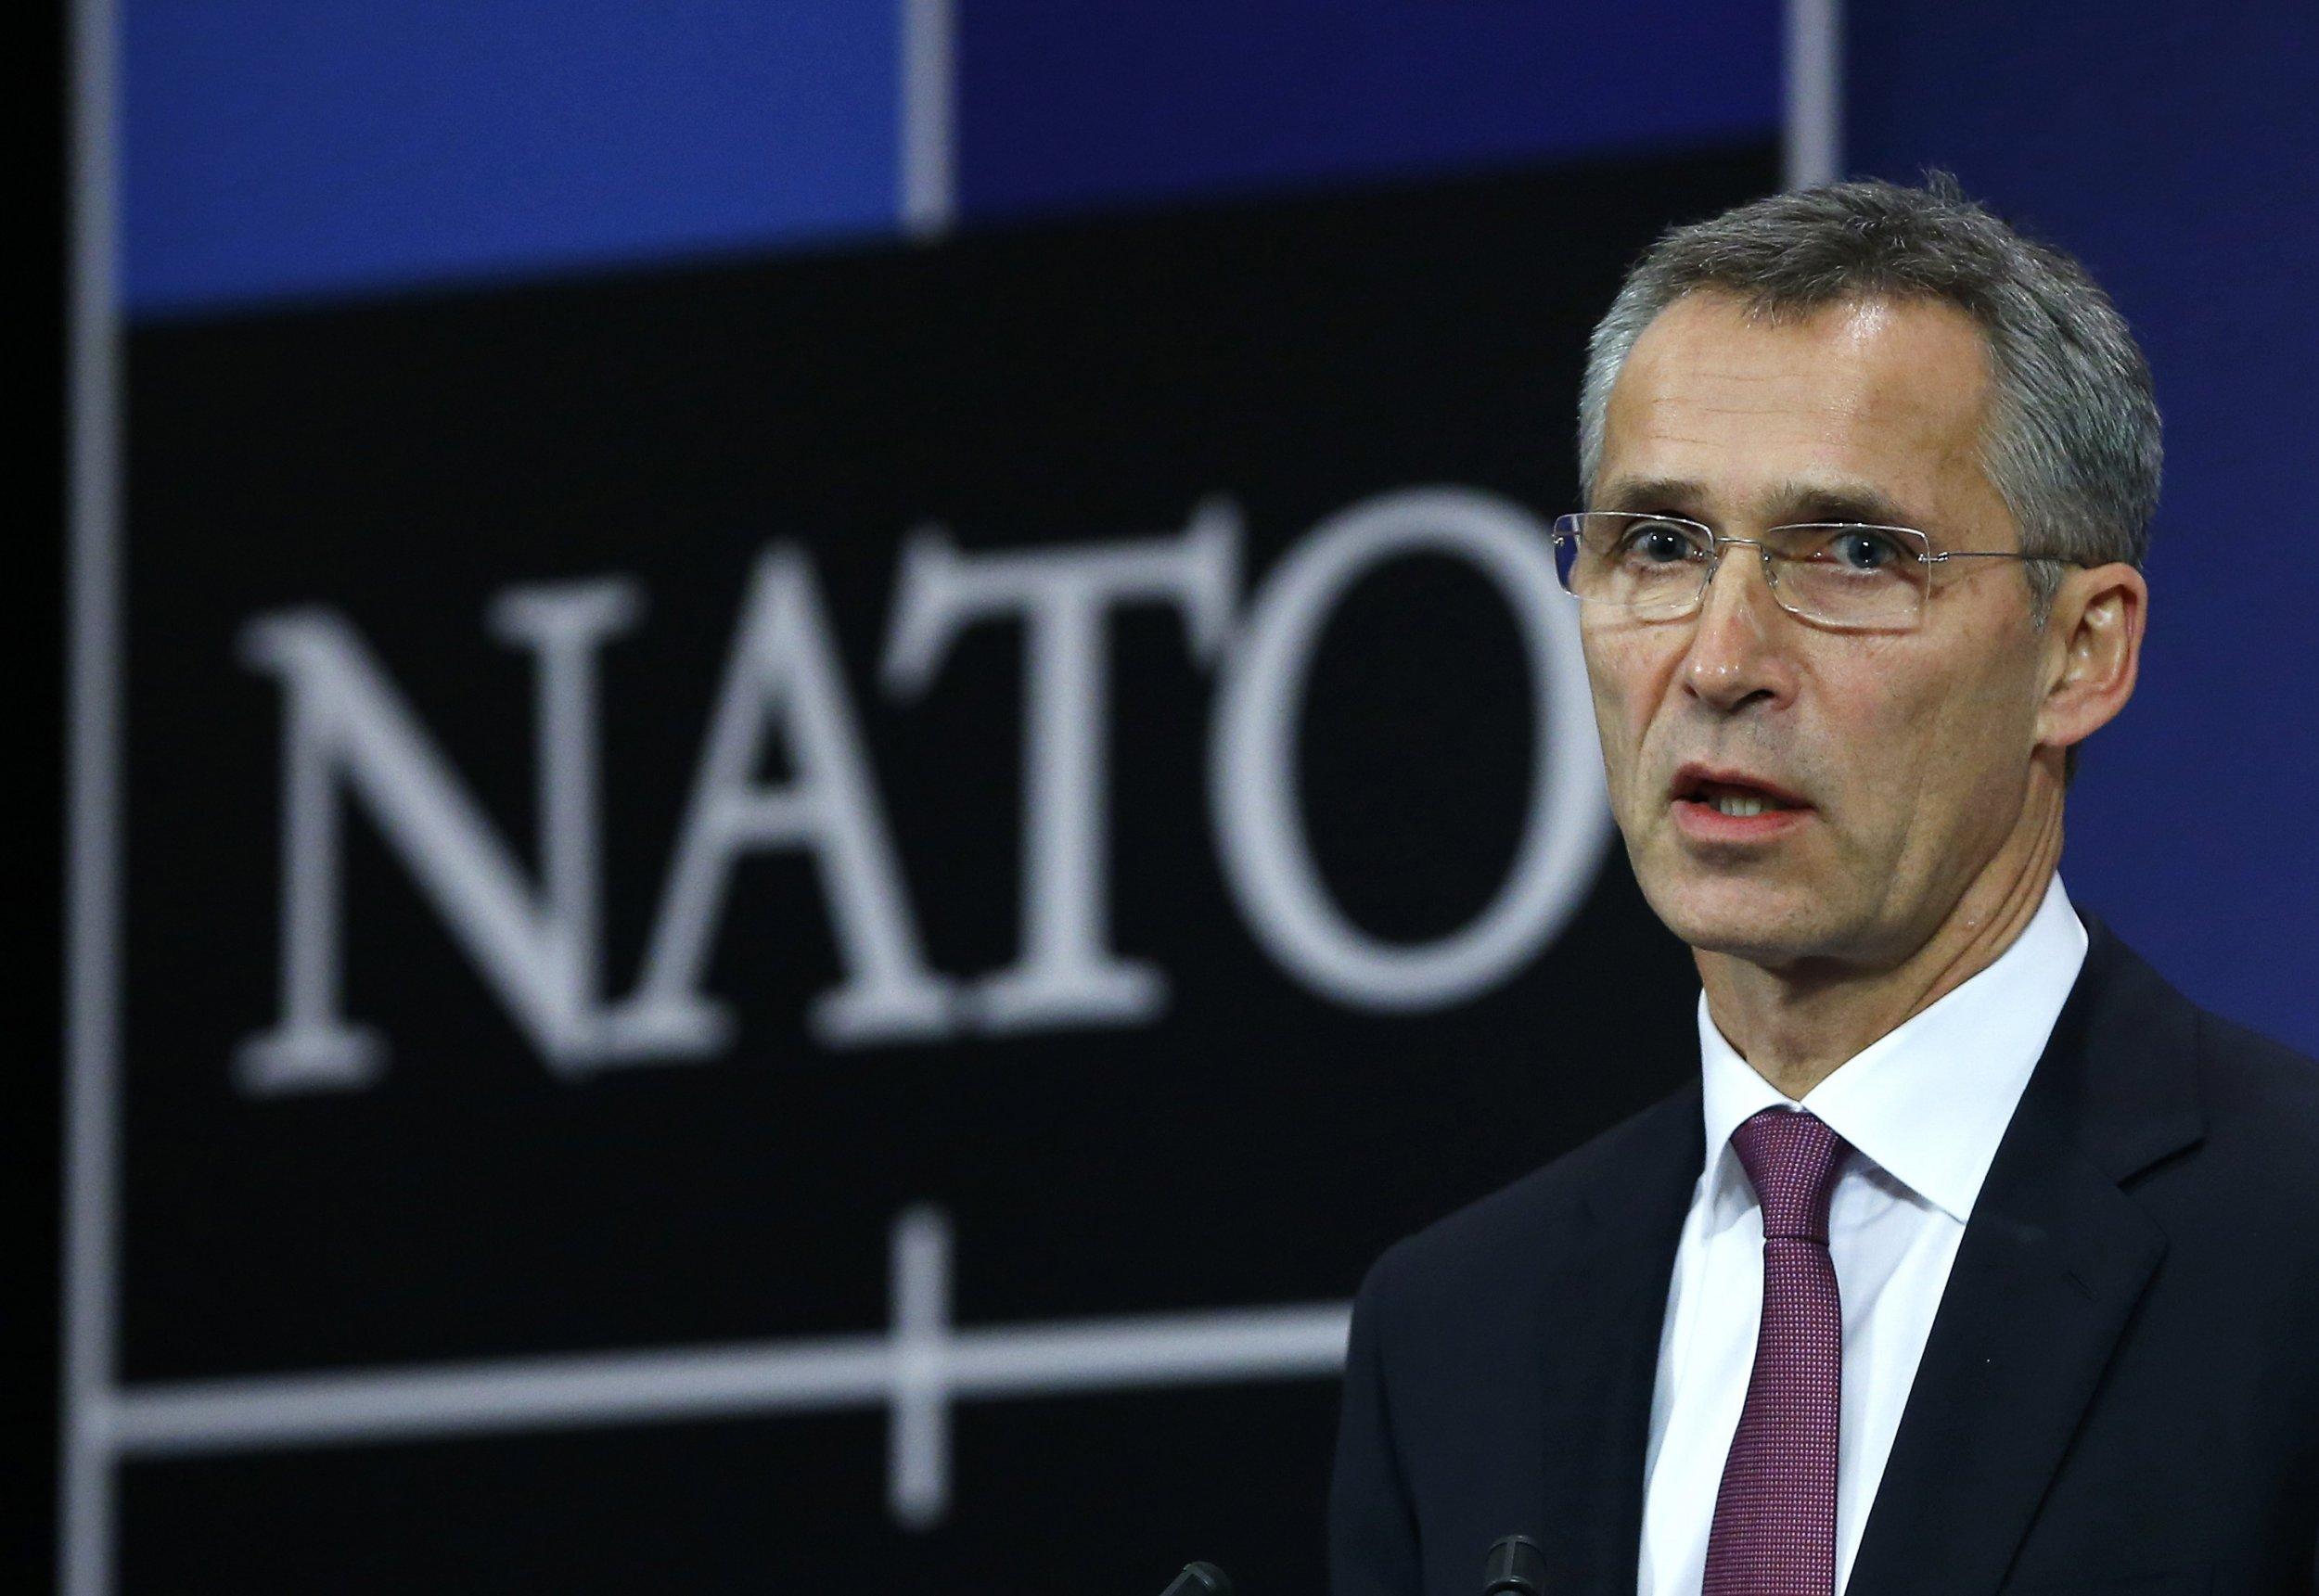 2014-12-02T125344Z_696554343_GM1EAC21LRP01_RTRMADP_3_UKRAINE-CRISIS-NATO